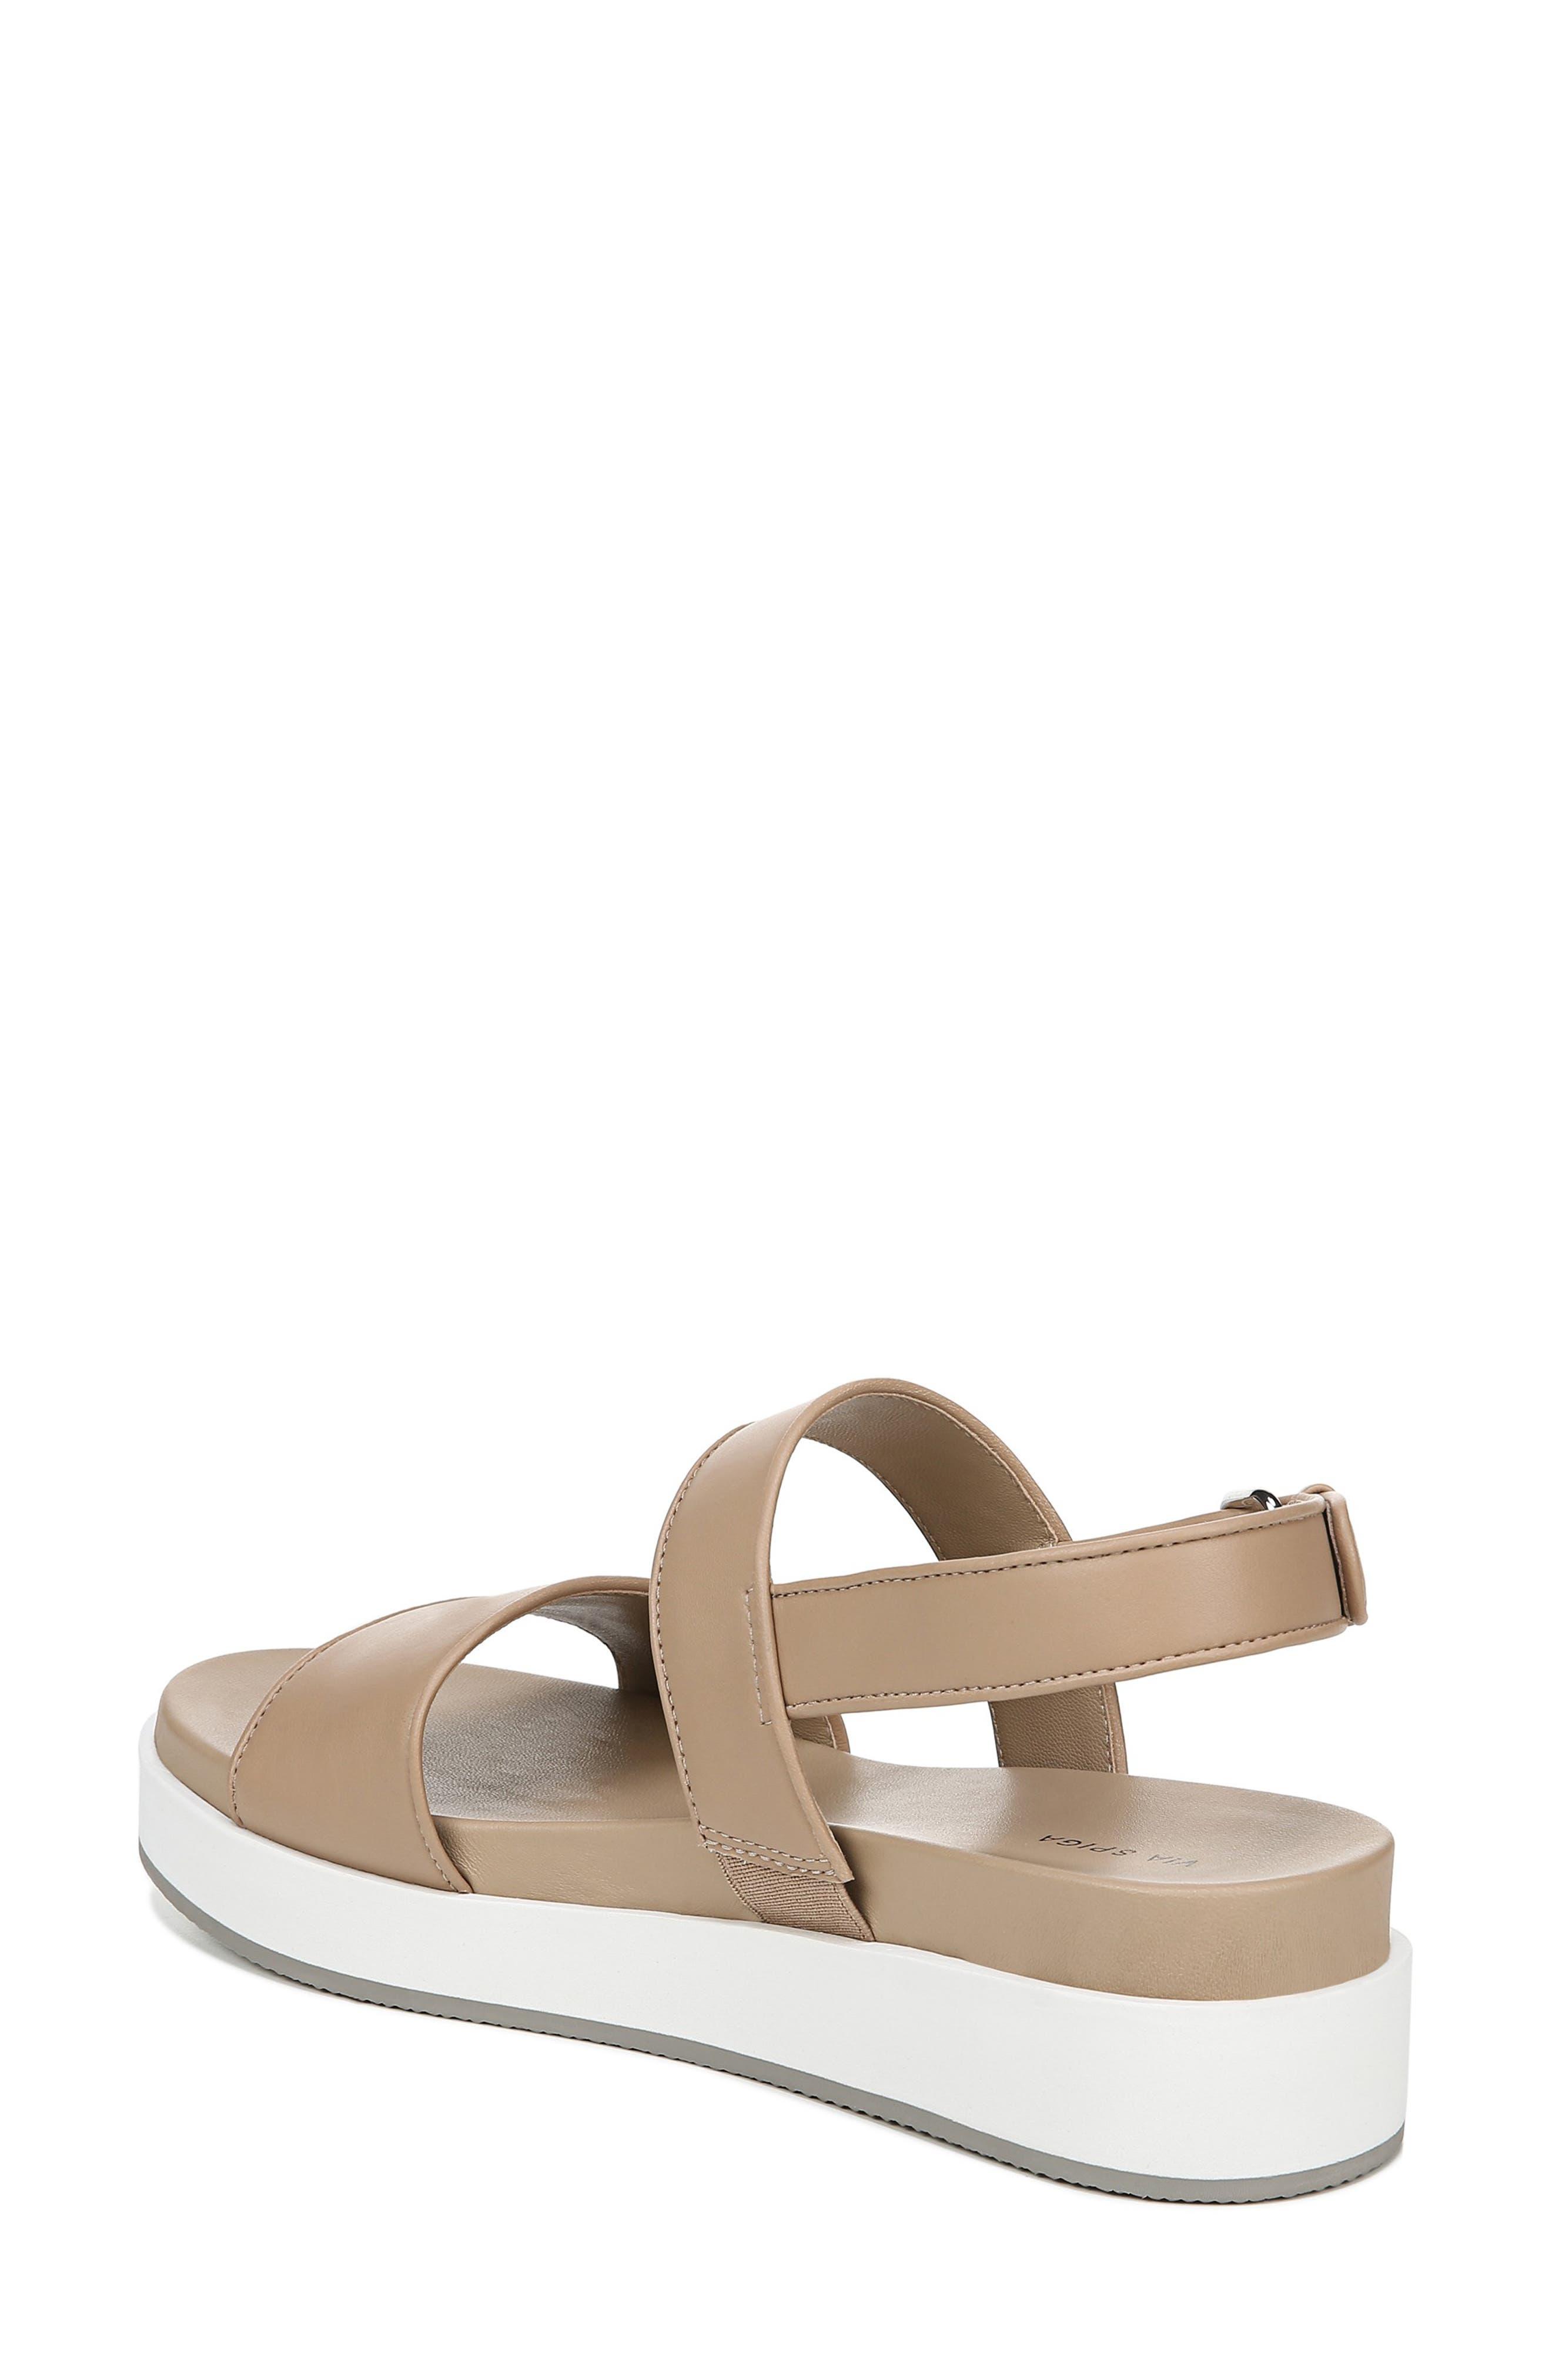 VIA SPIGA, Davi Platform Sandal, Alternate thumbnail 2, color, DESERT NAPPA